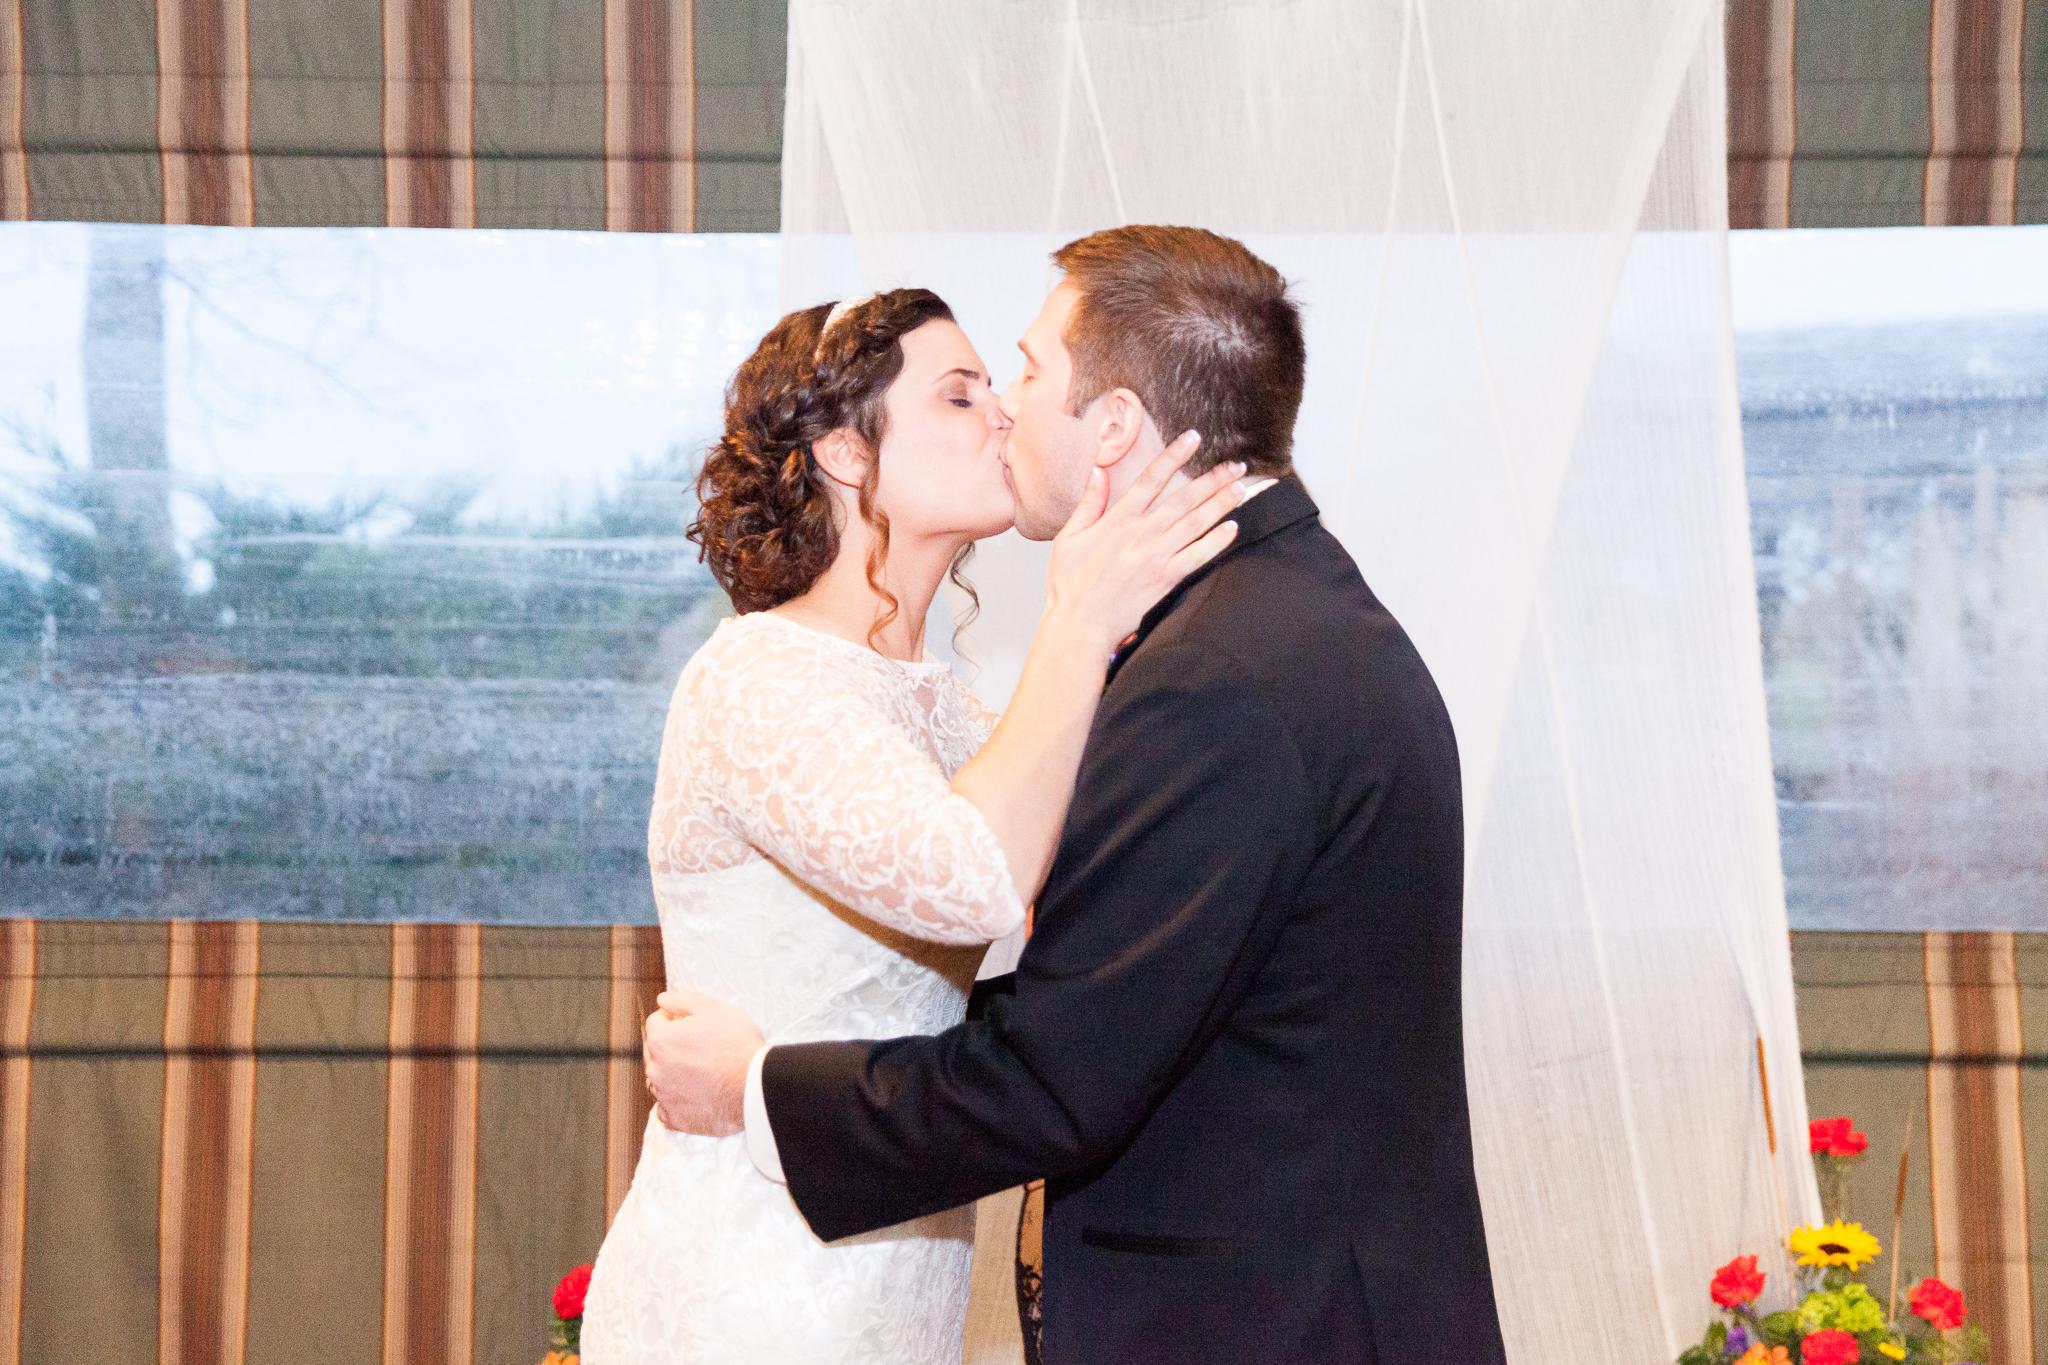 camuglia-whomstudio-chelsea_and_andy-nycphotographer-wedding-brooklyn-buffalo-timberlodge-088-0638.jpg